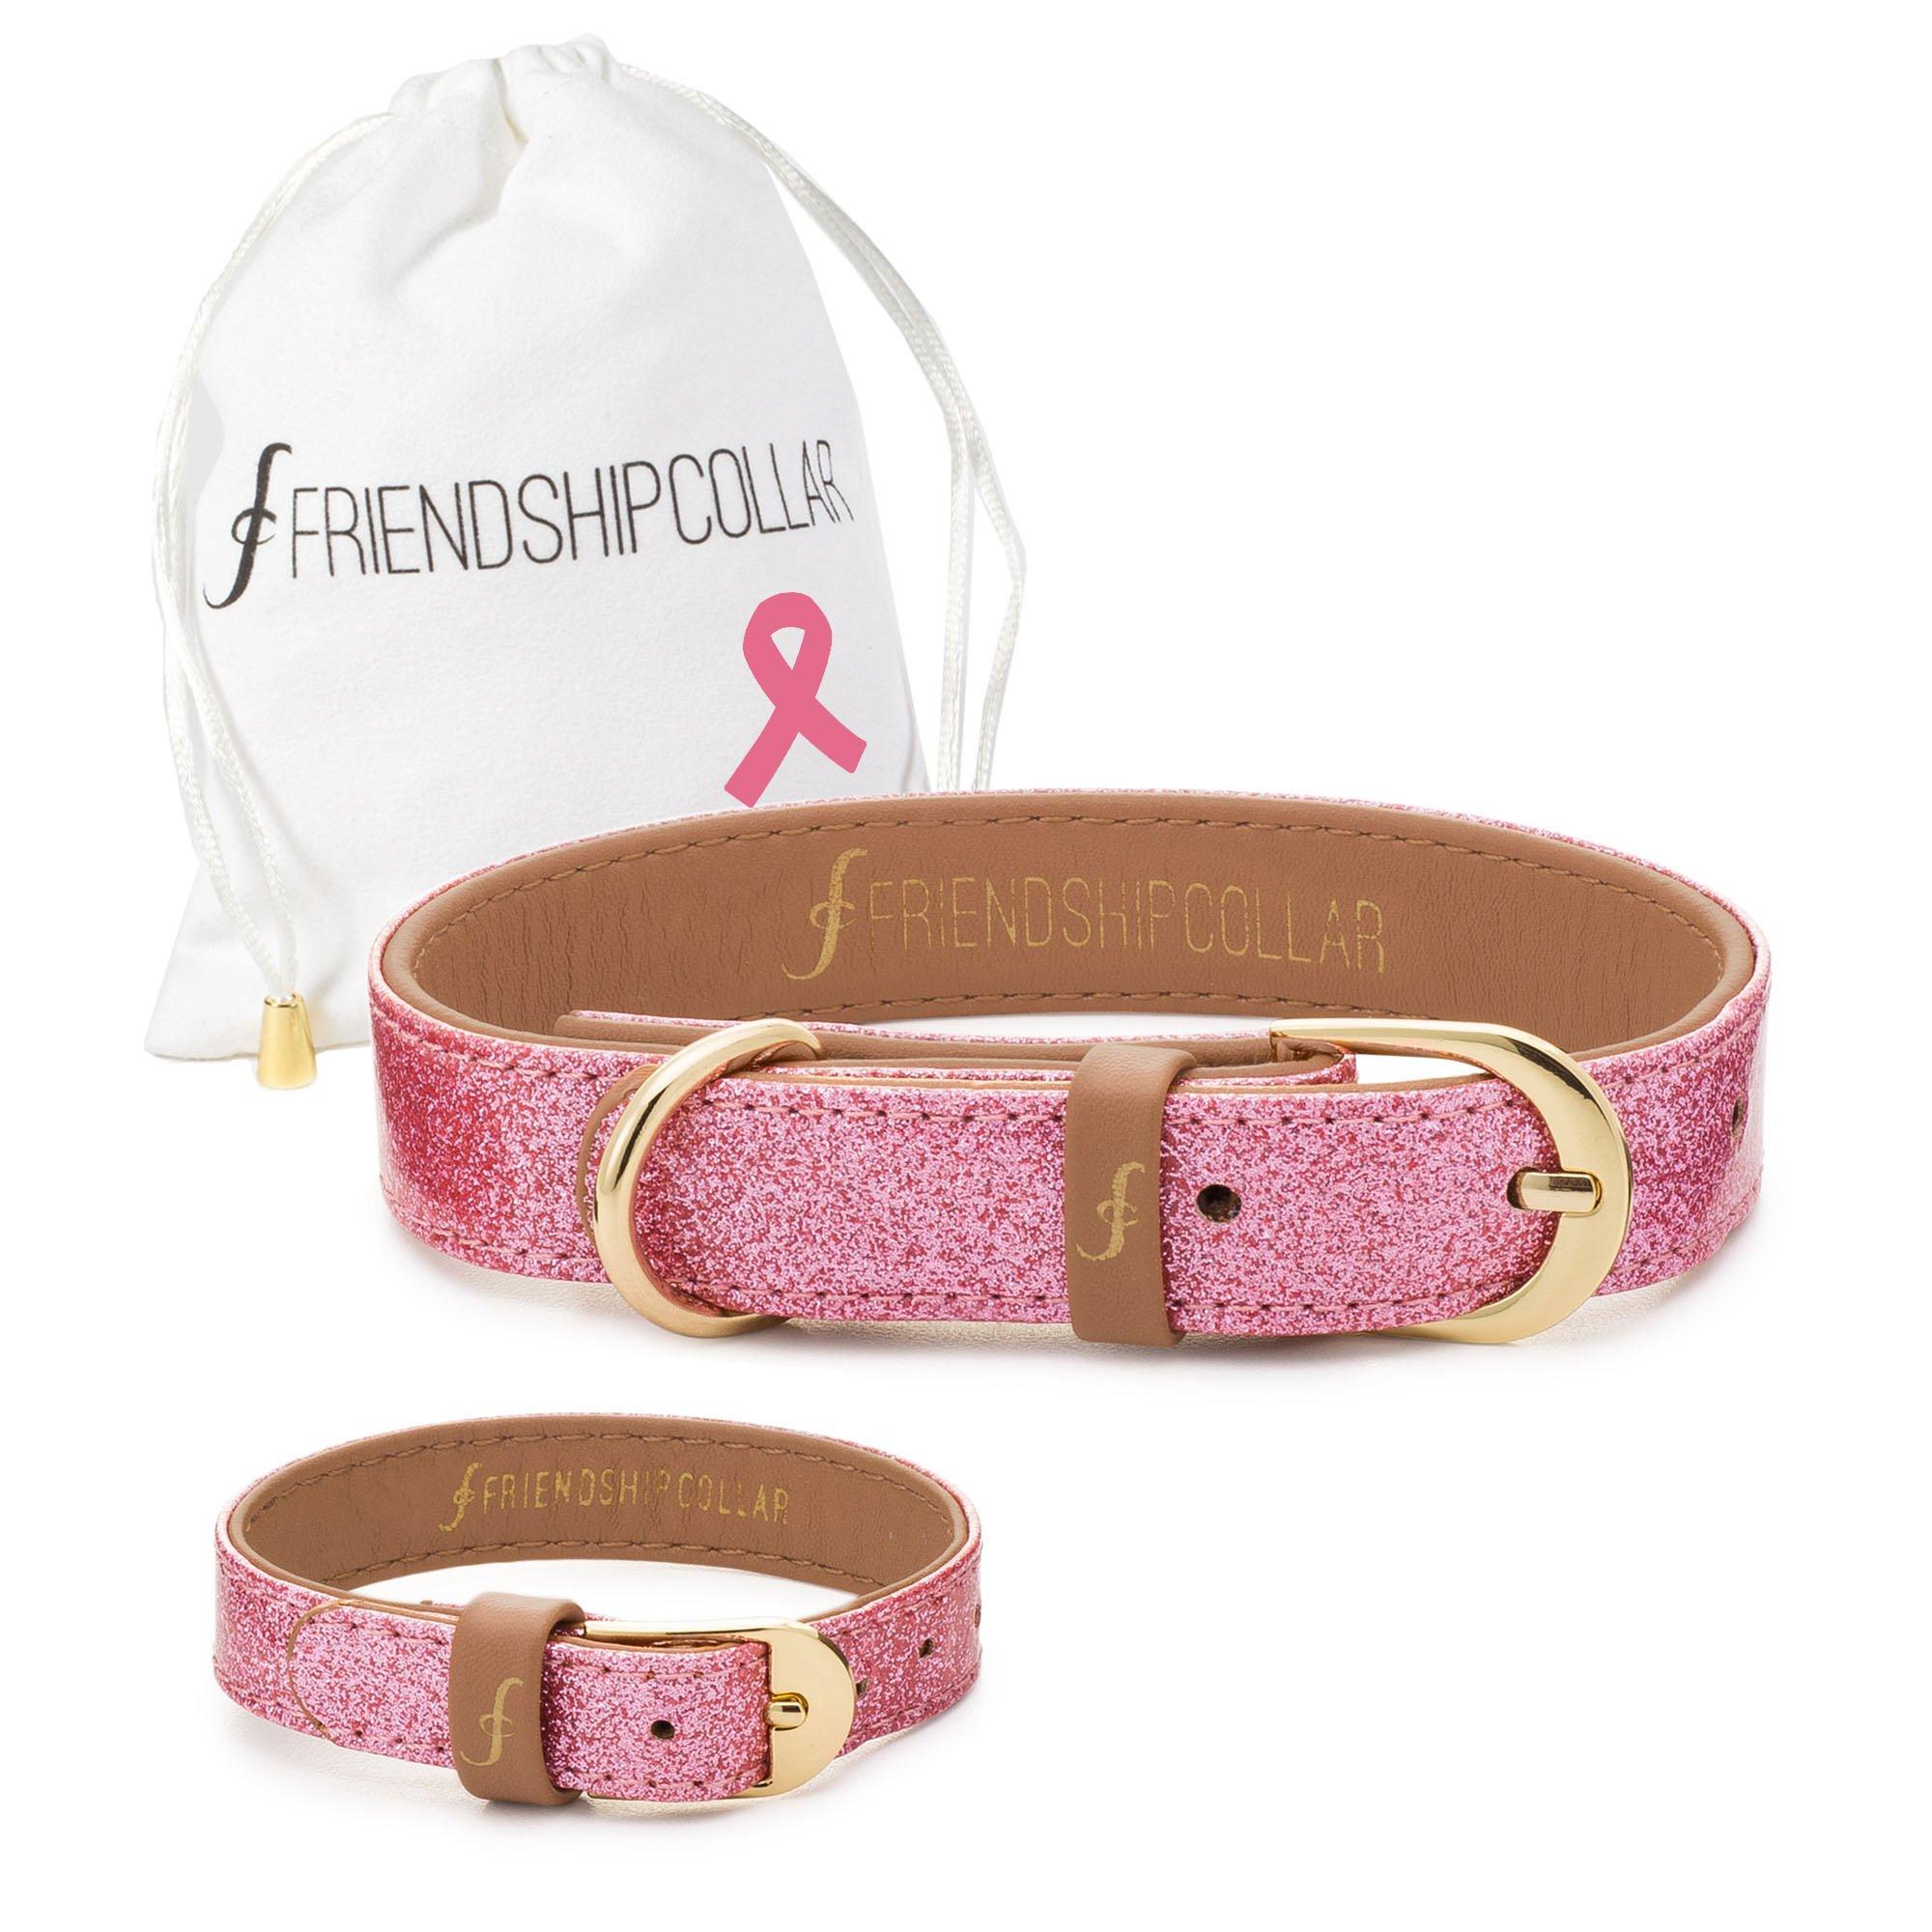 FriendshipCollar Dog Collar and Friendship Bracelet - Glitter Pink - X Small